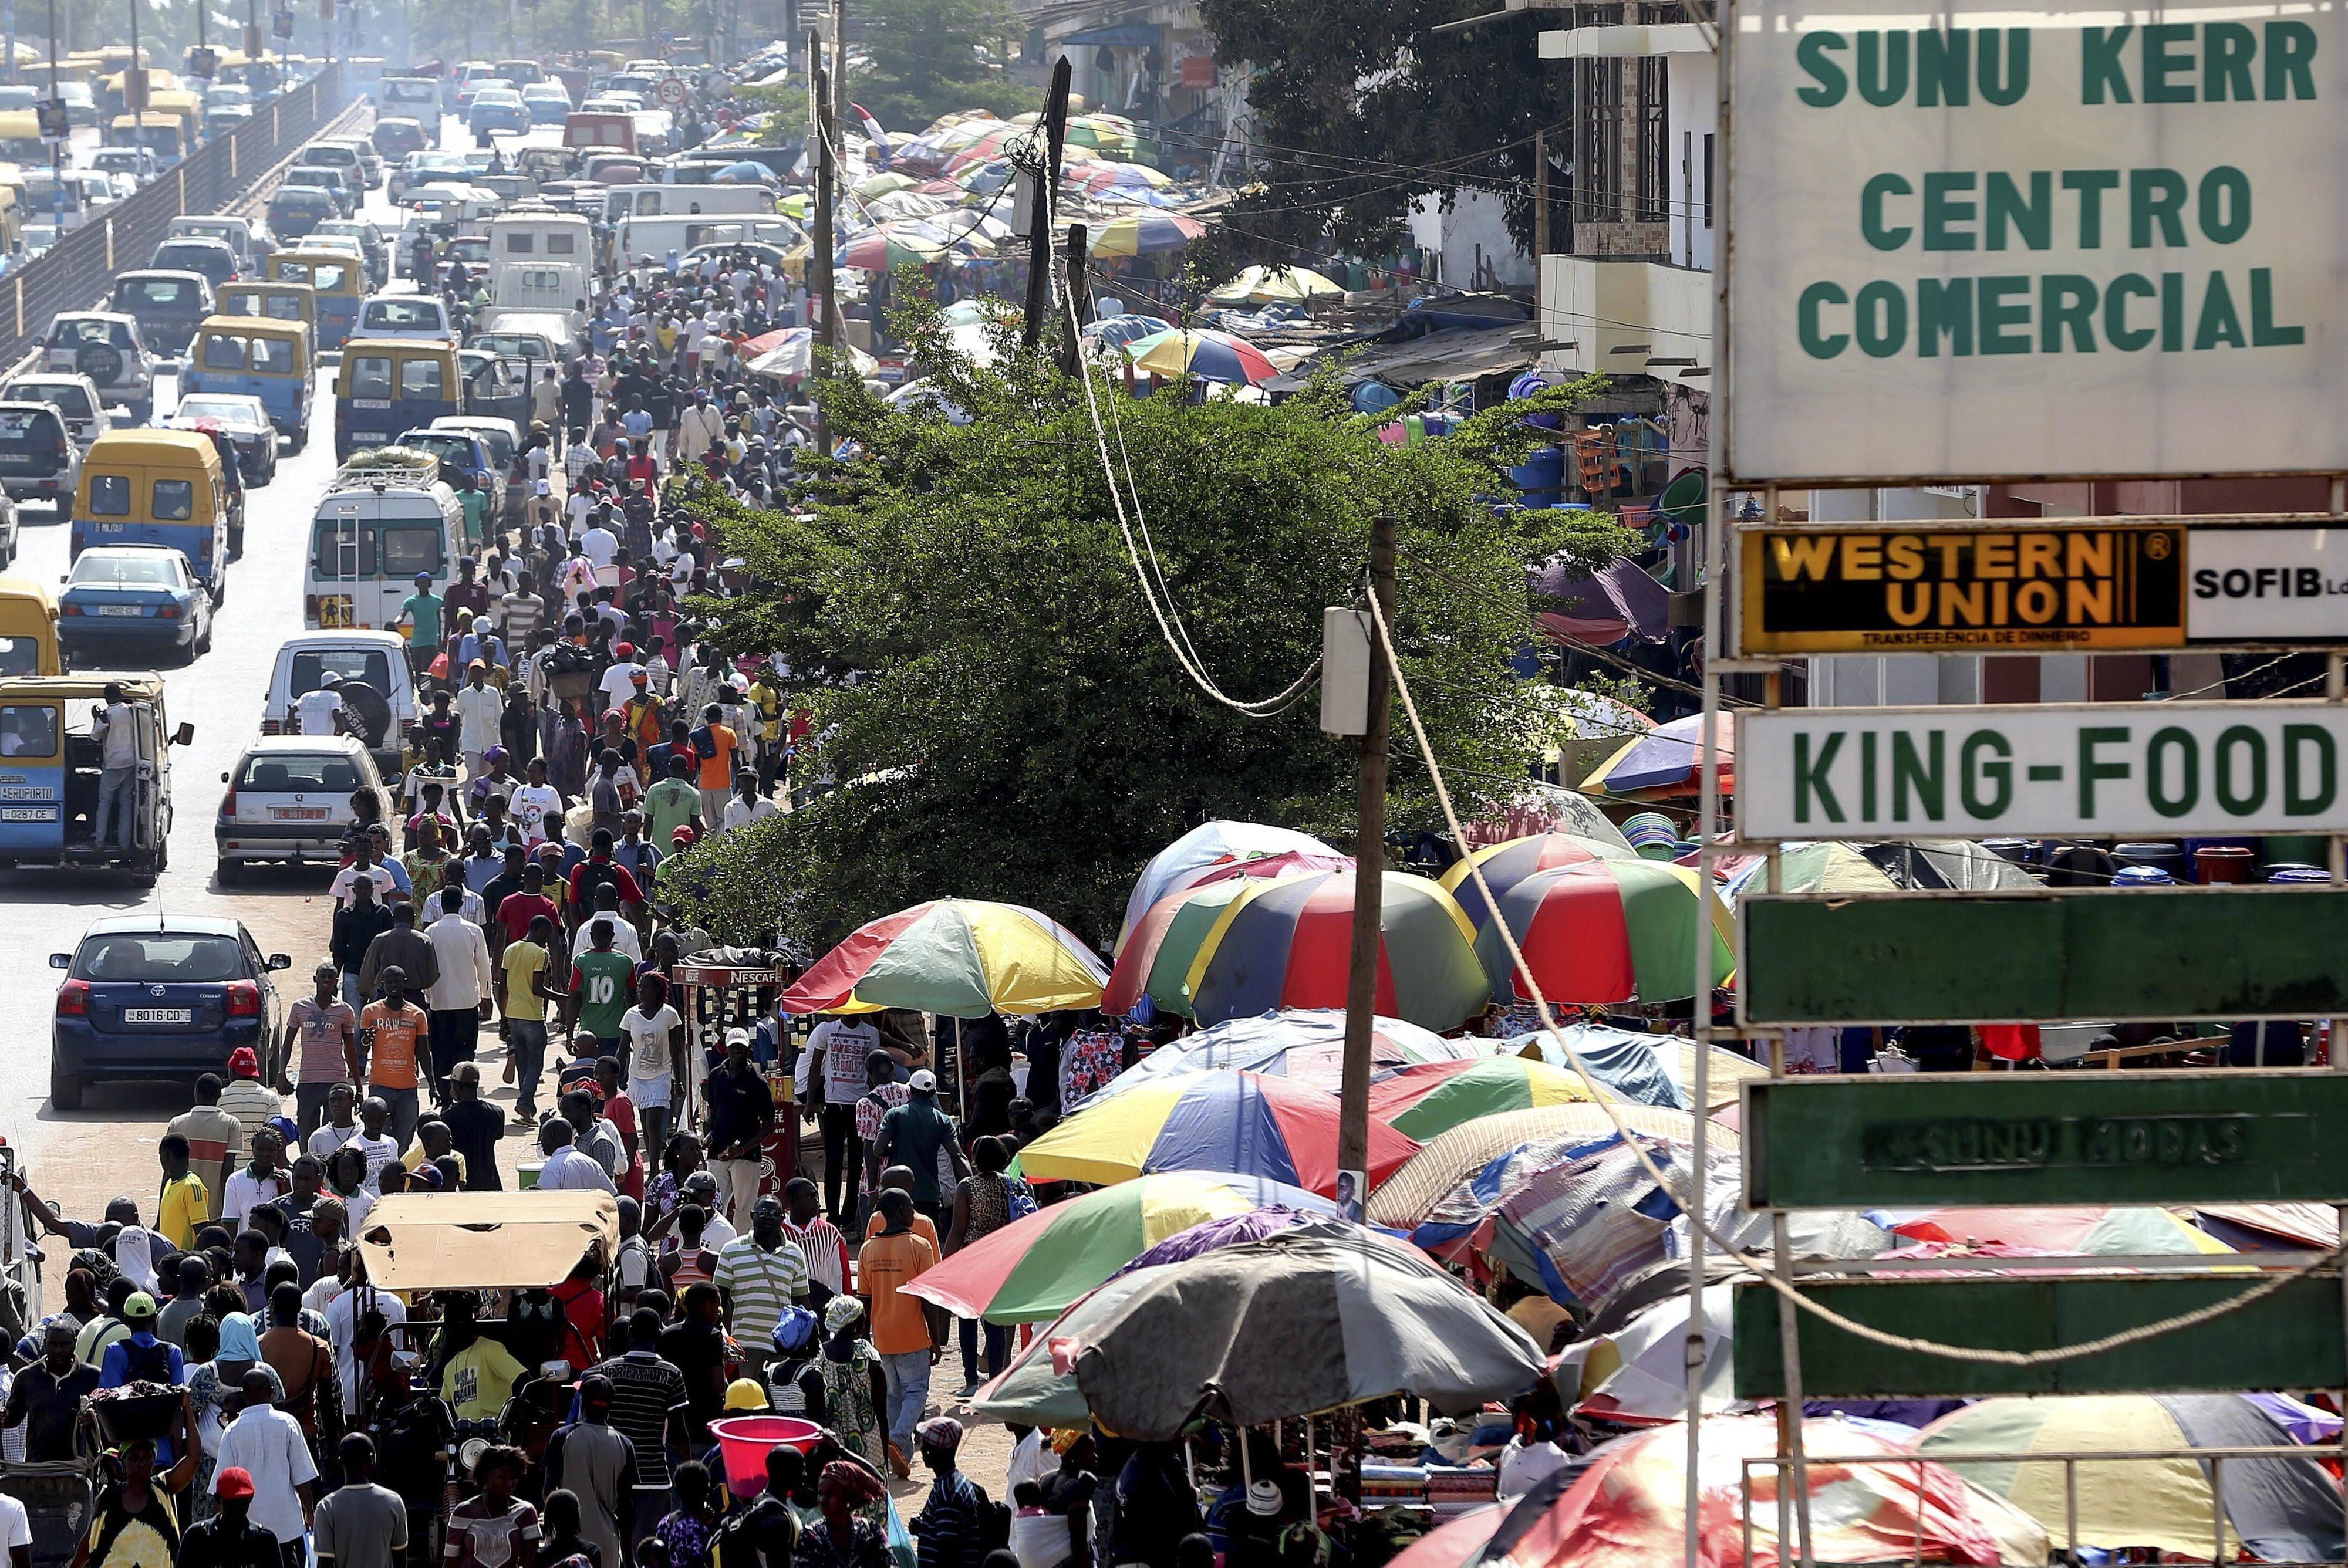 Economista alerta que crédito mal parado à banca guineense ascende a 230,3 ME